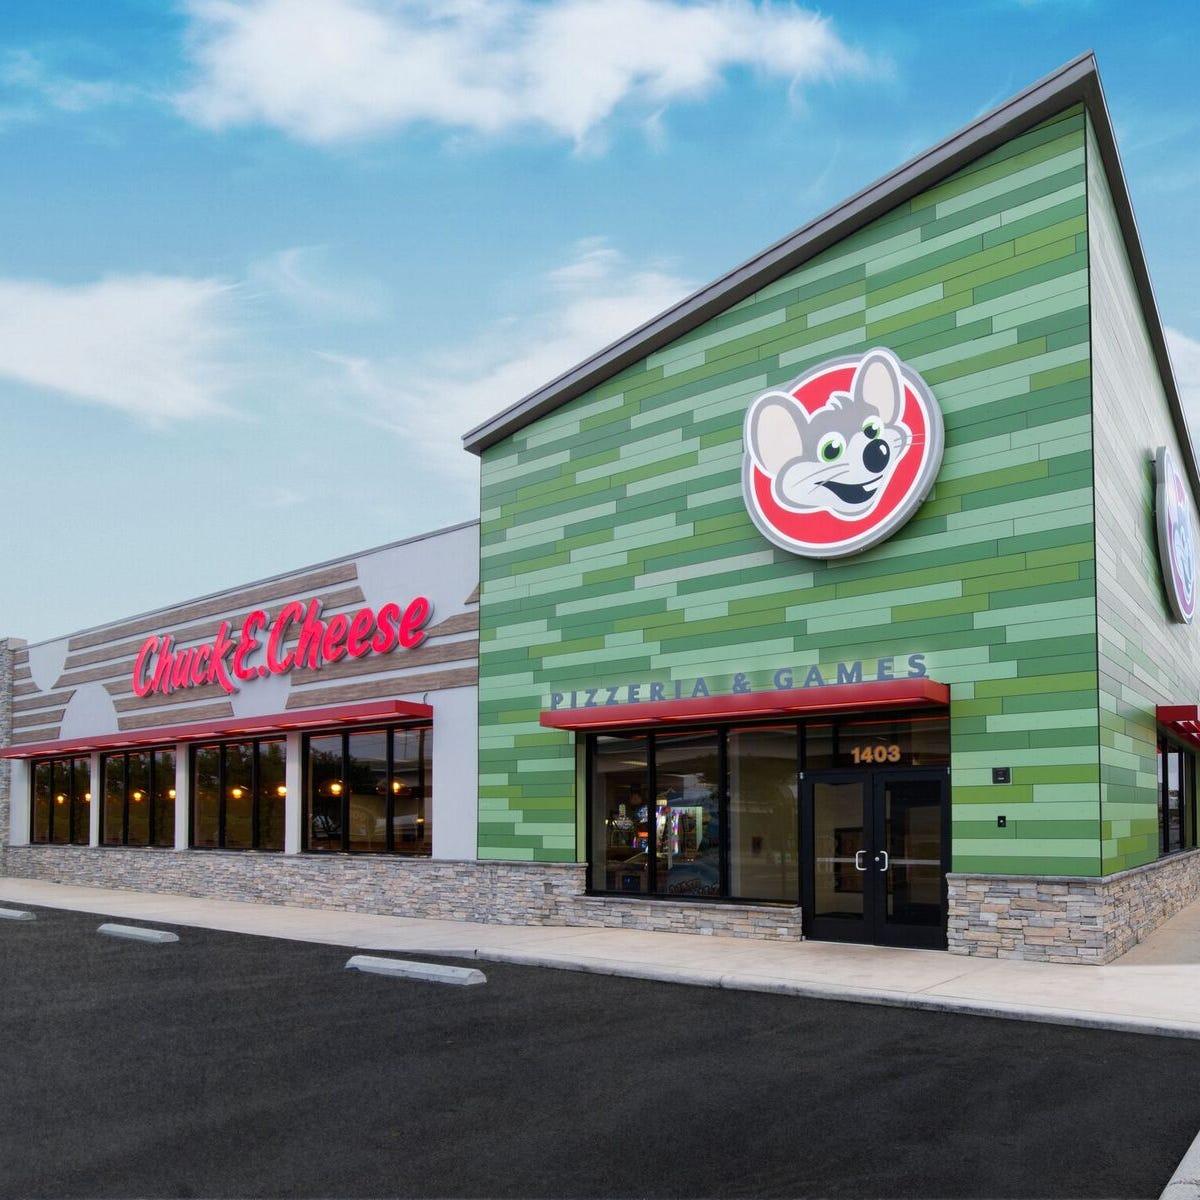 Pensacola Chuck E. Cheese to unveil major renovations this week